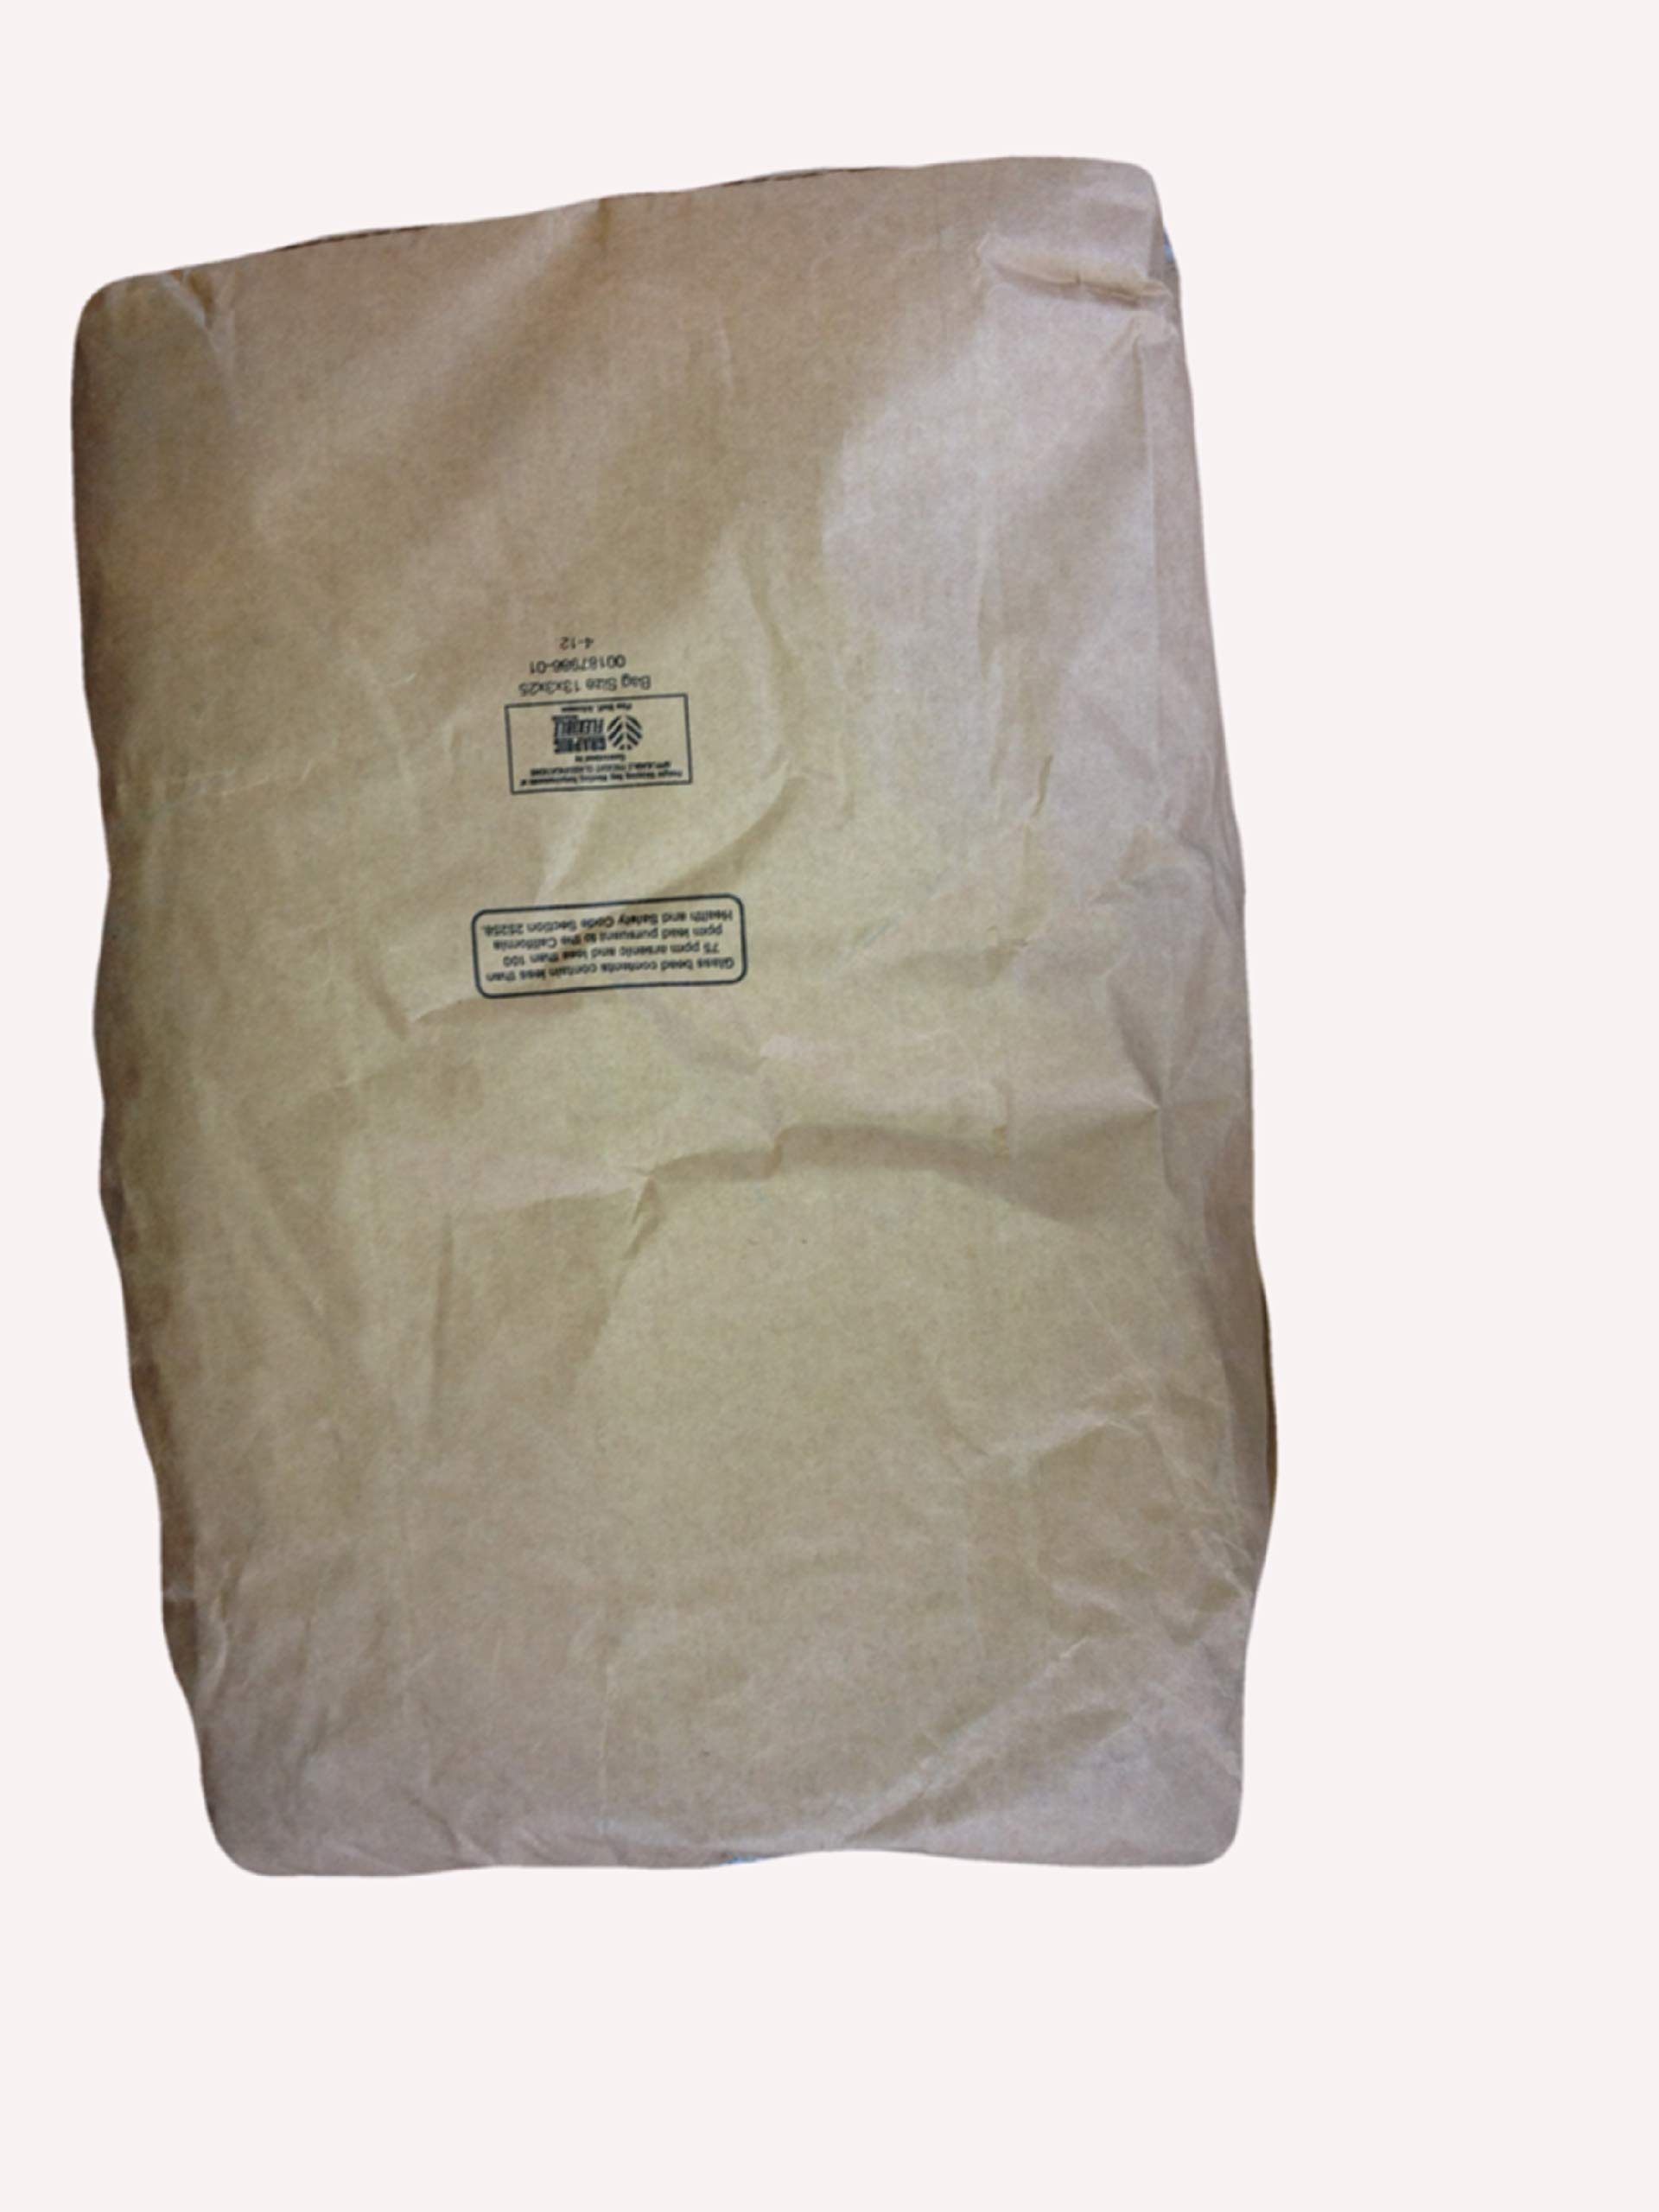 Standard DOT Reflective Glass Beads 50 Pound Bag